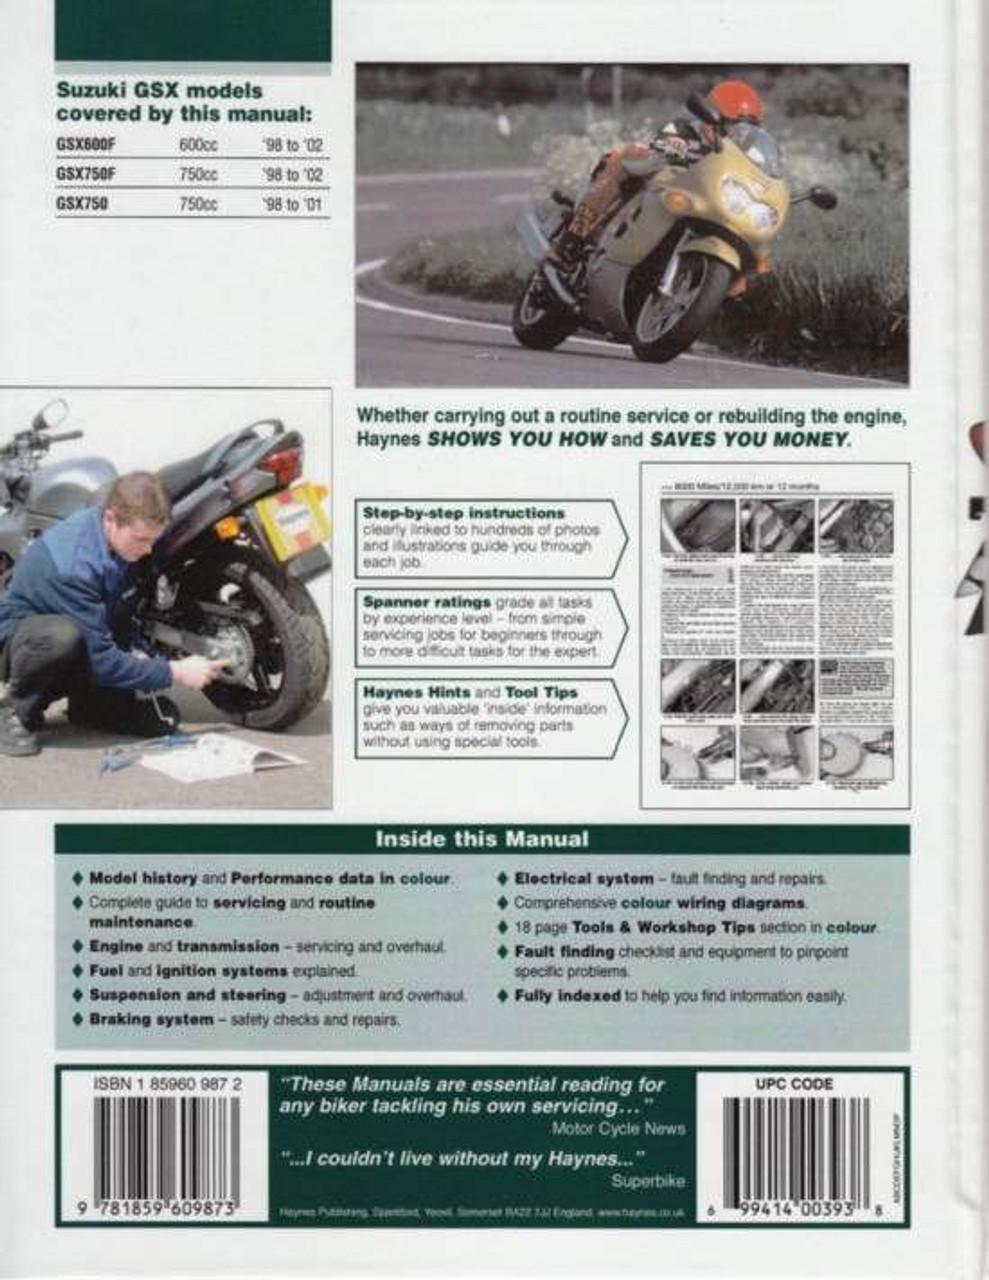 Buy Suzuki GSX600F, GSX750F, GSX750 1998 - 2002 Workshop Manual